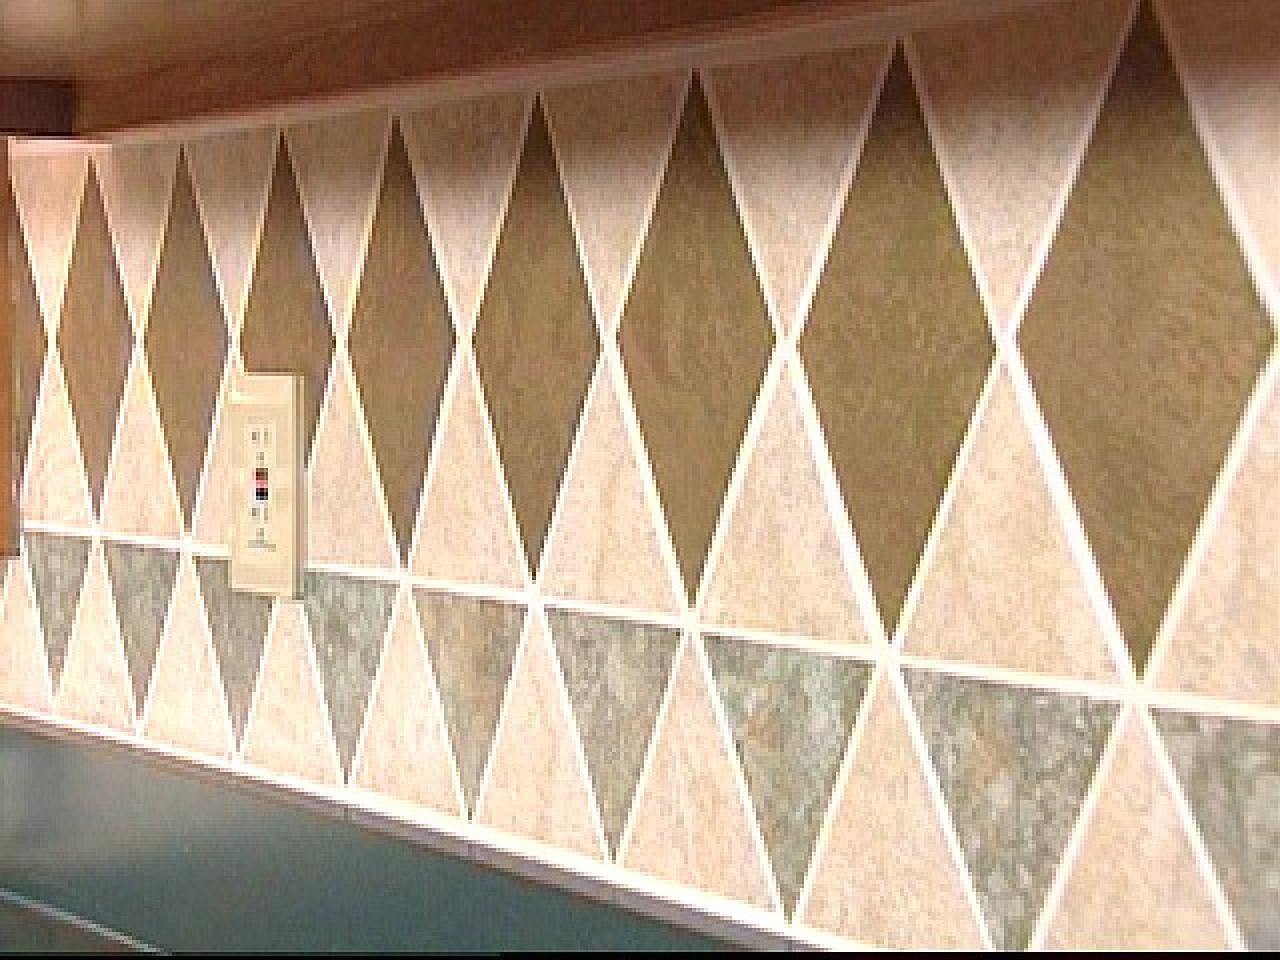 - Free Download Install A Tile Wallpaper Backsplash Kitchen Ideas